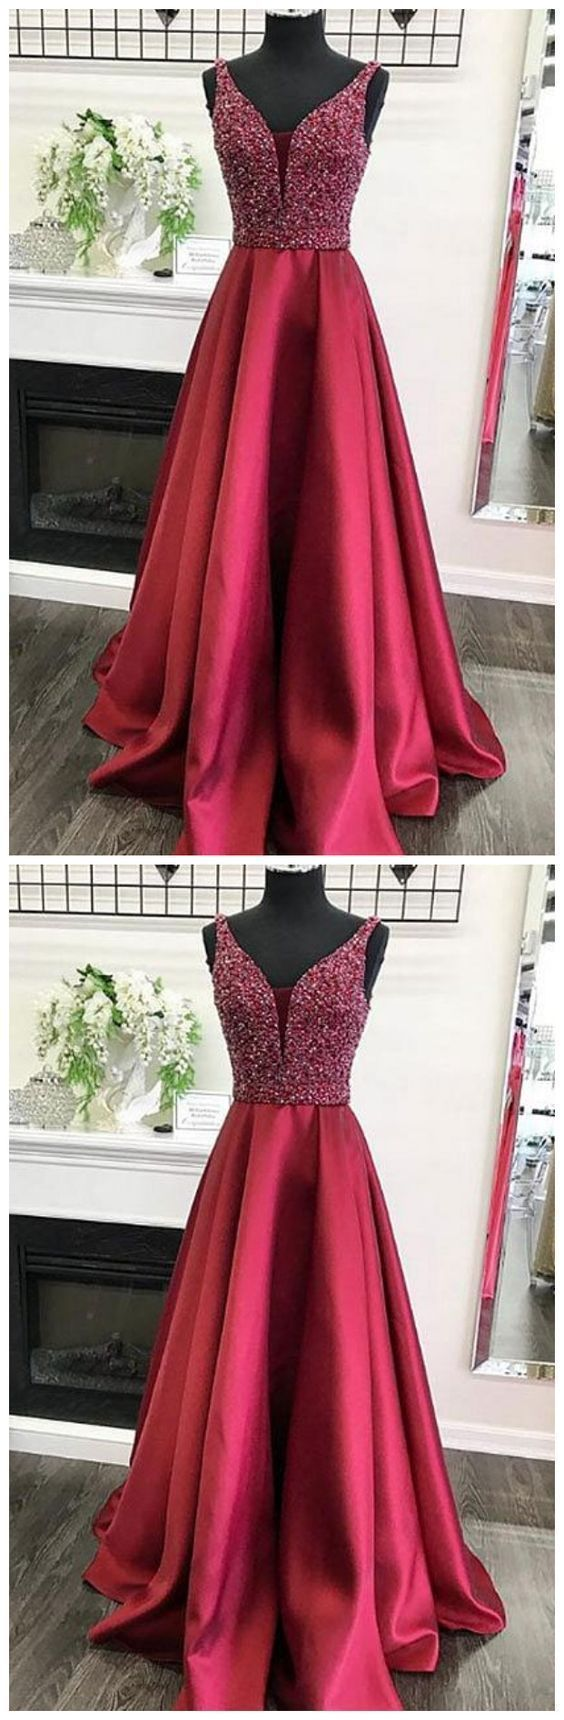 Beaded A-line Long Prom Dress School Dance Dress Fashion Winter Formal Dress YDP0367 #schooldancedresses